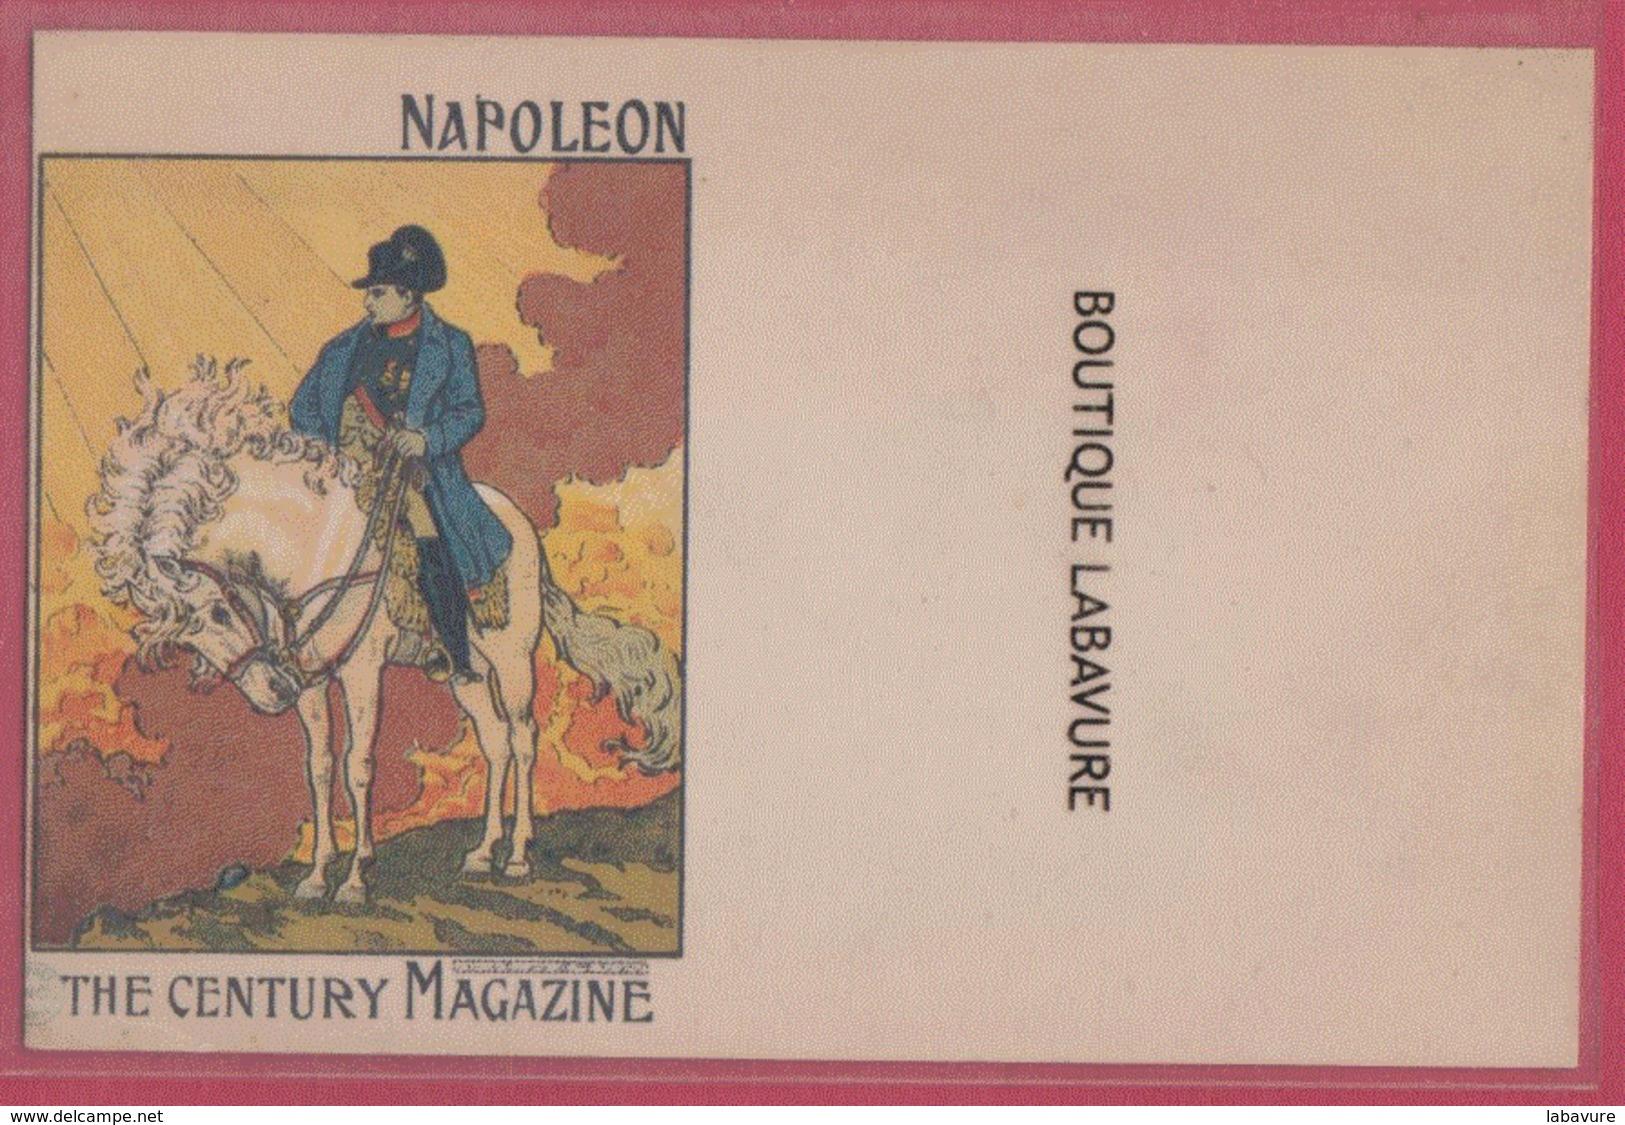 COLLECTION CIRNOS---Illustrateur Grasset---Napoleon--The Century Magazine - Illustrateurs & Photographes